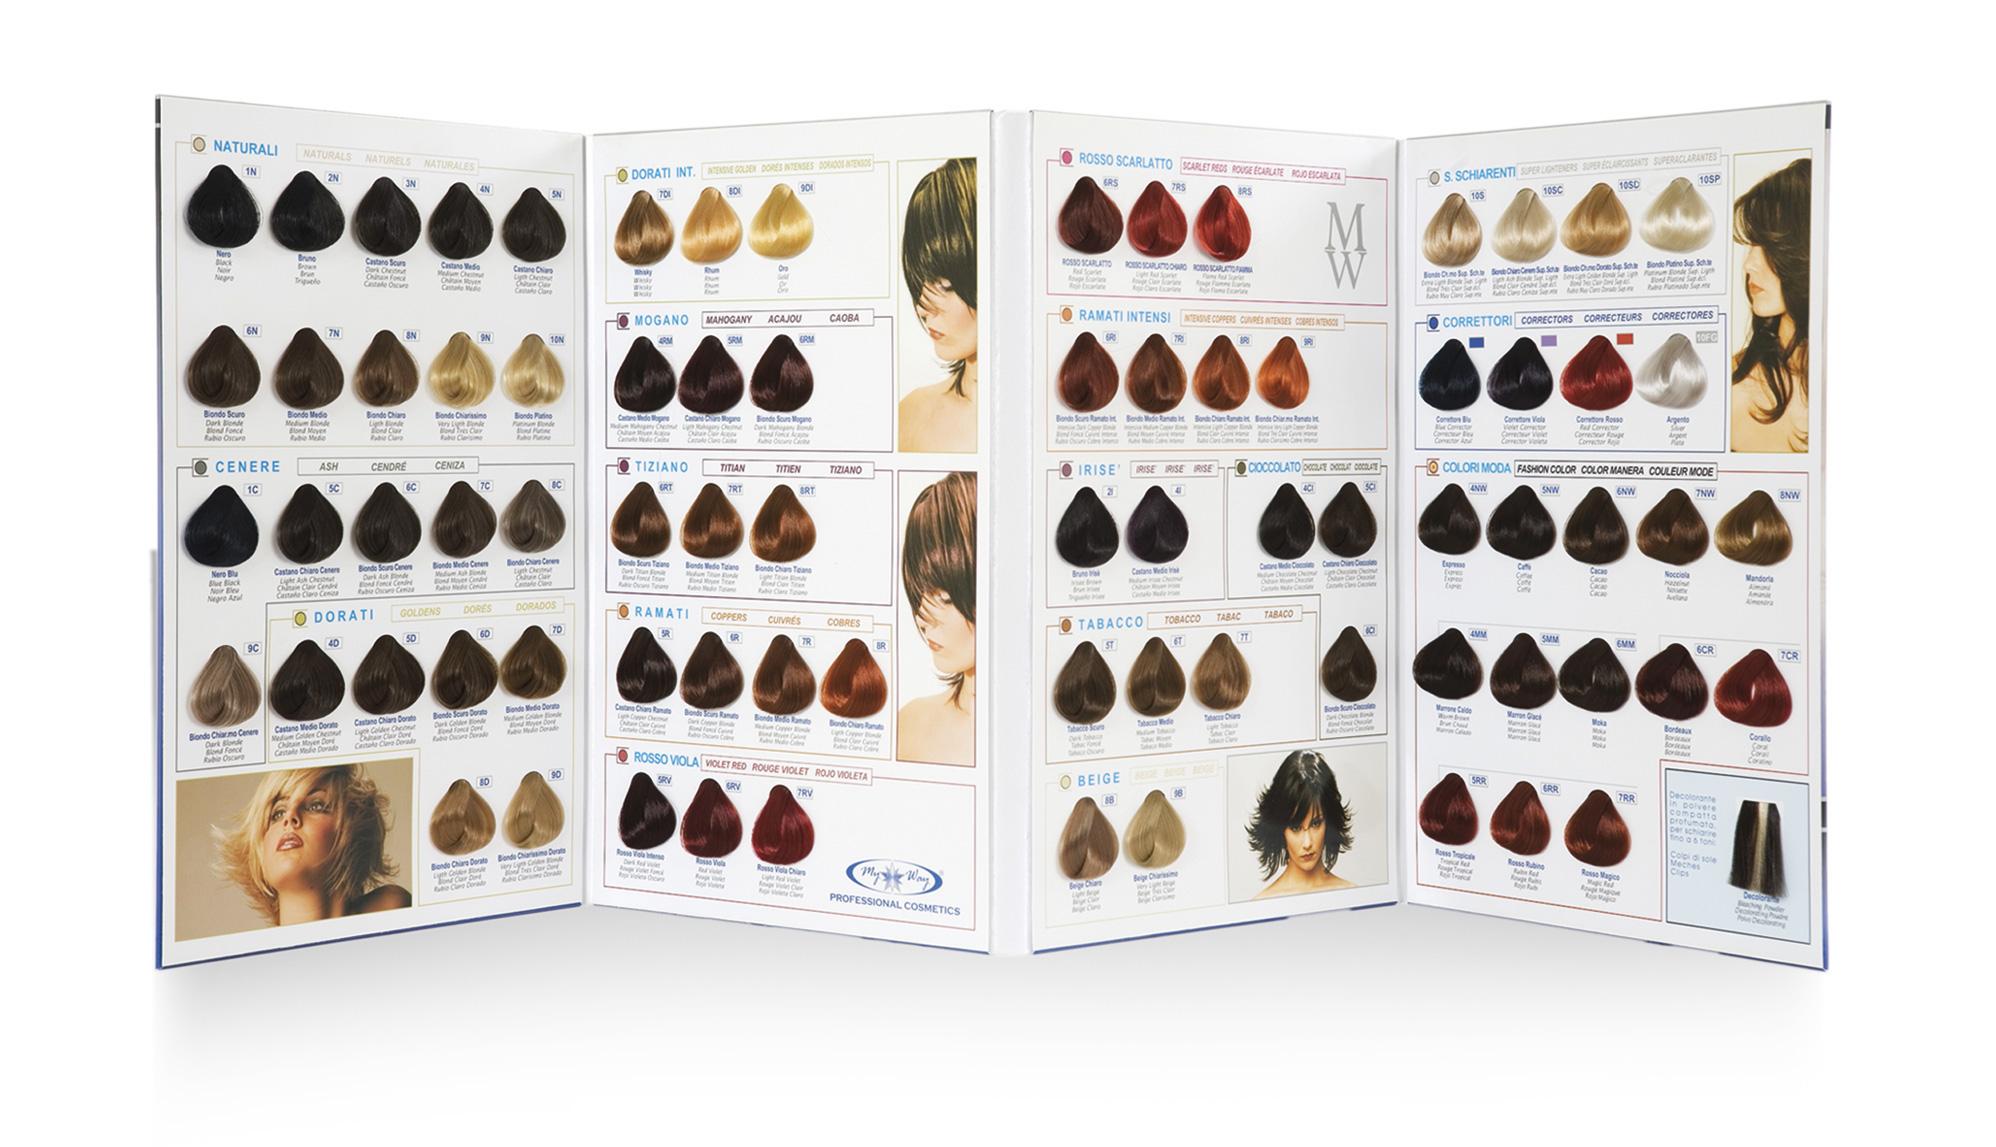 Conosciuto My Way | Professional Cosmetics » Linea Color AG77